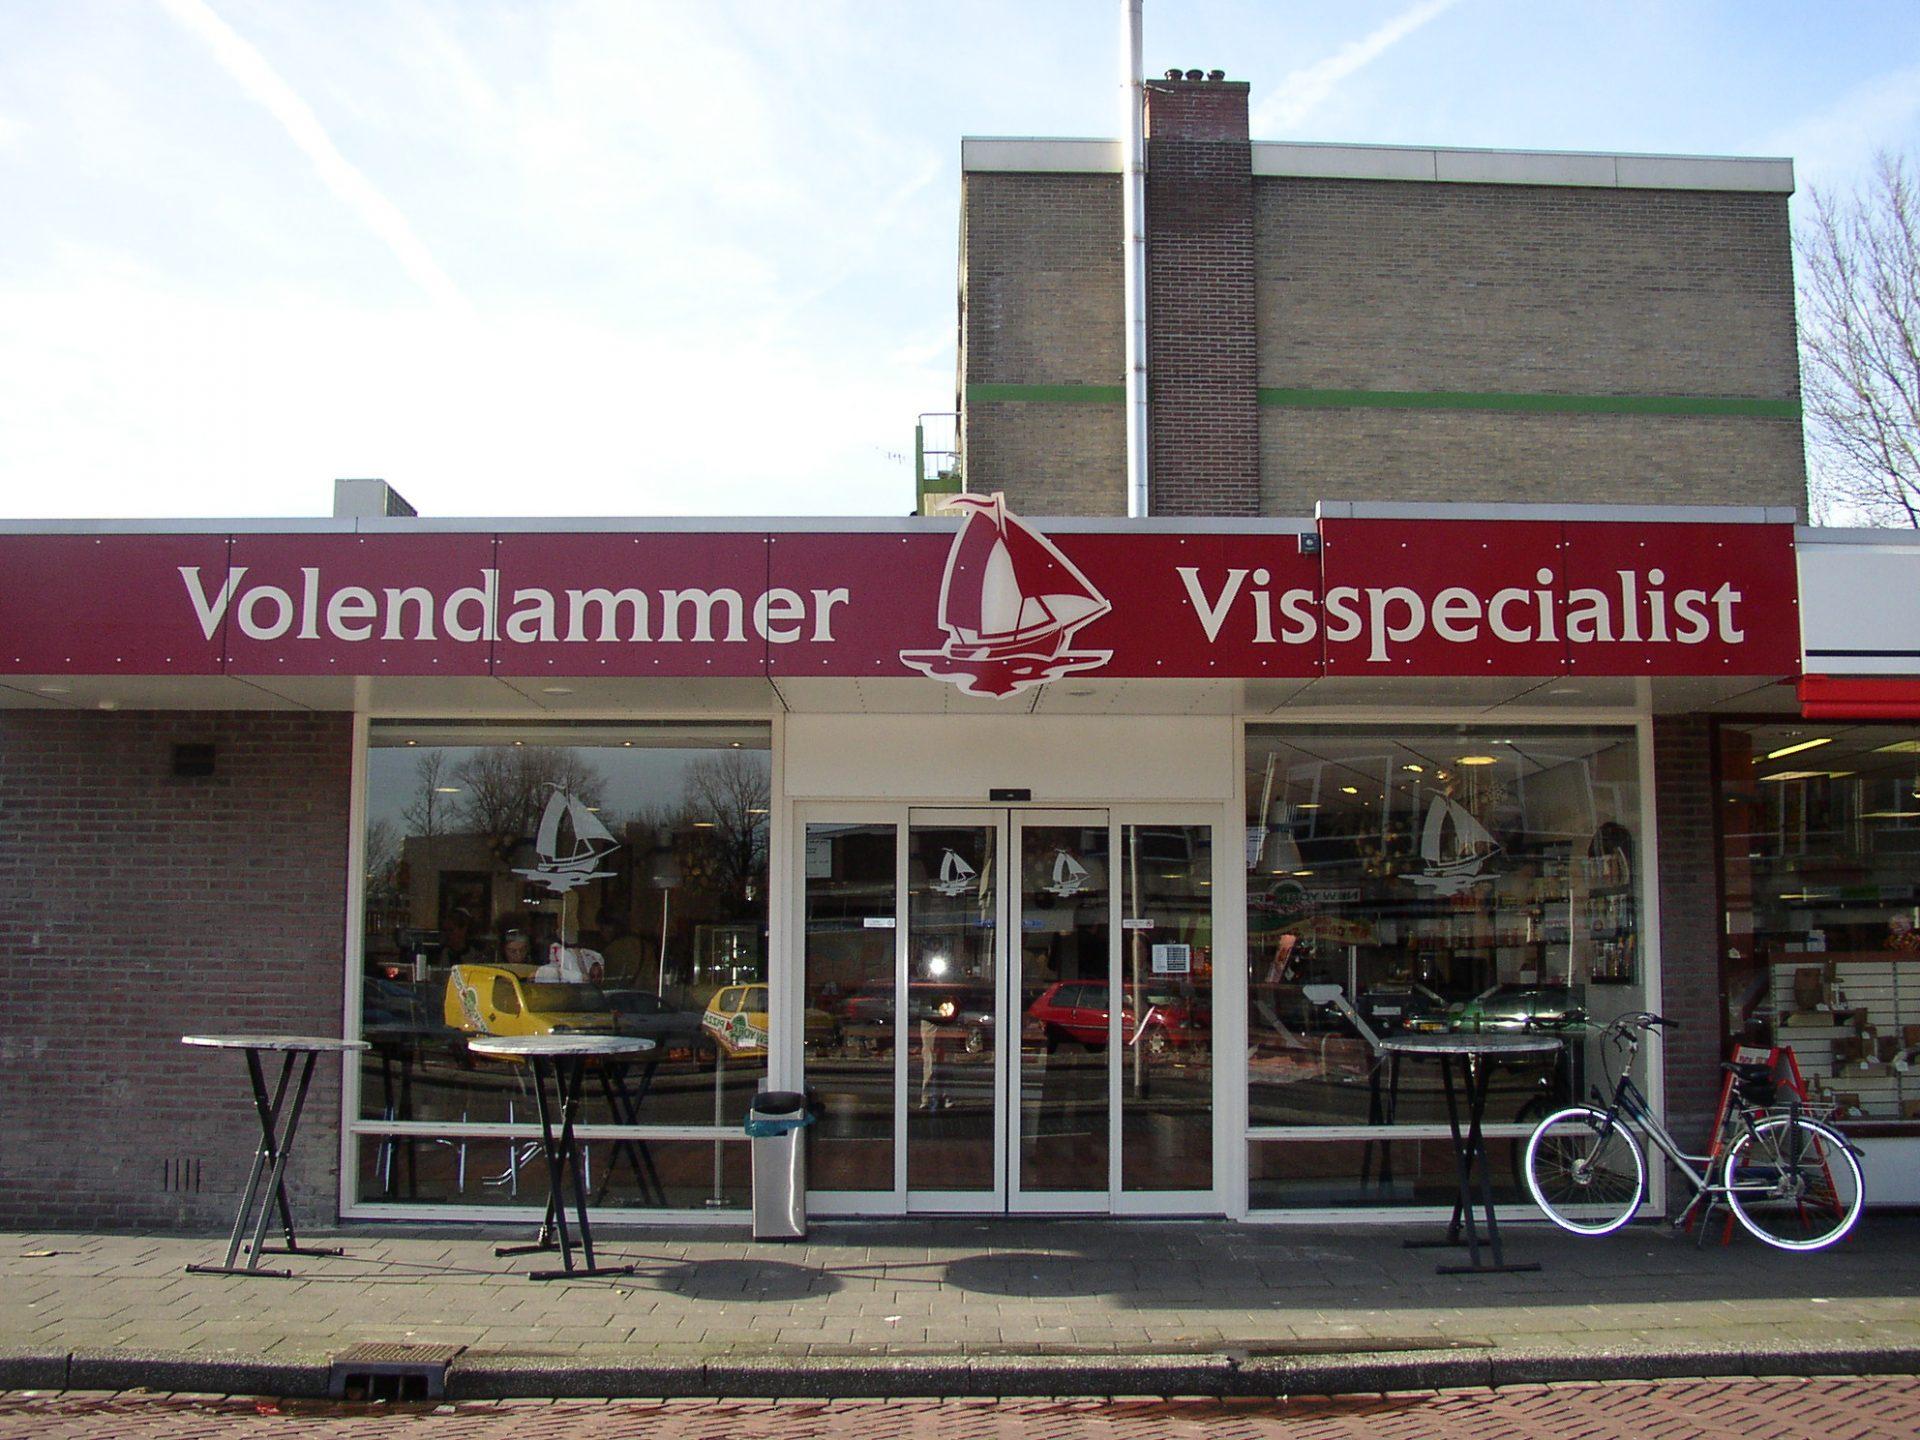 Visspecialist Schilder in Amstelveen